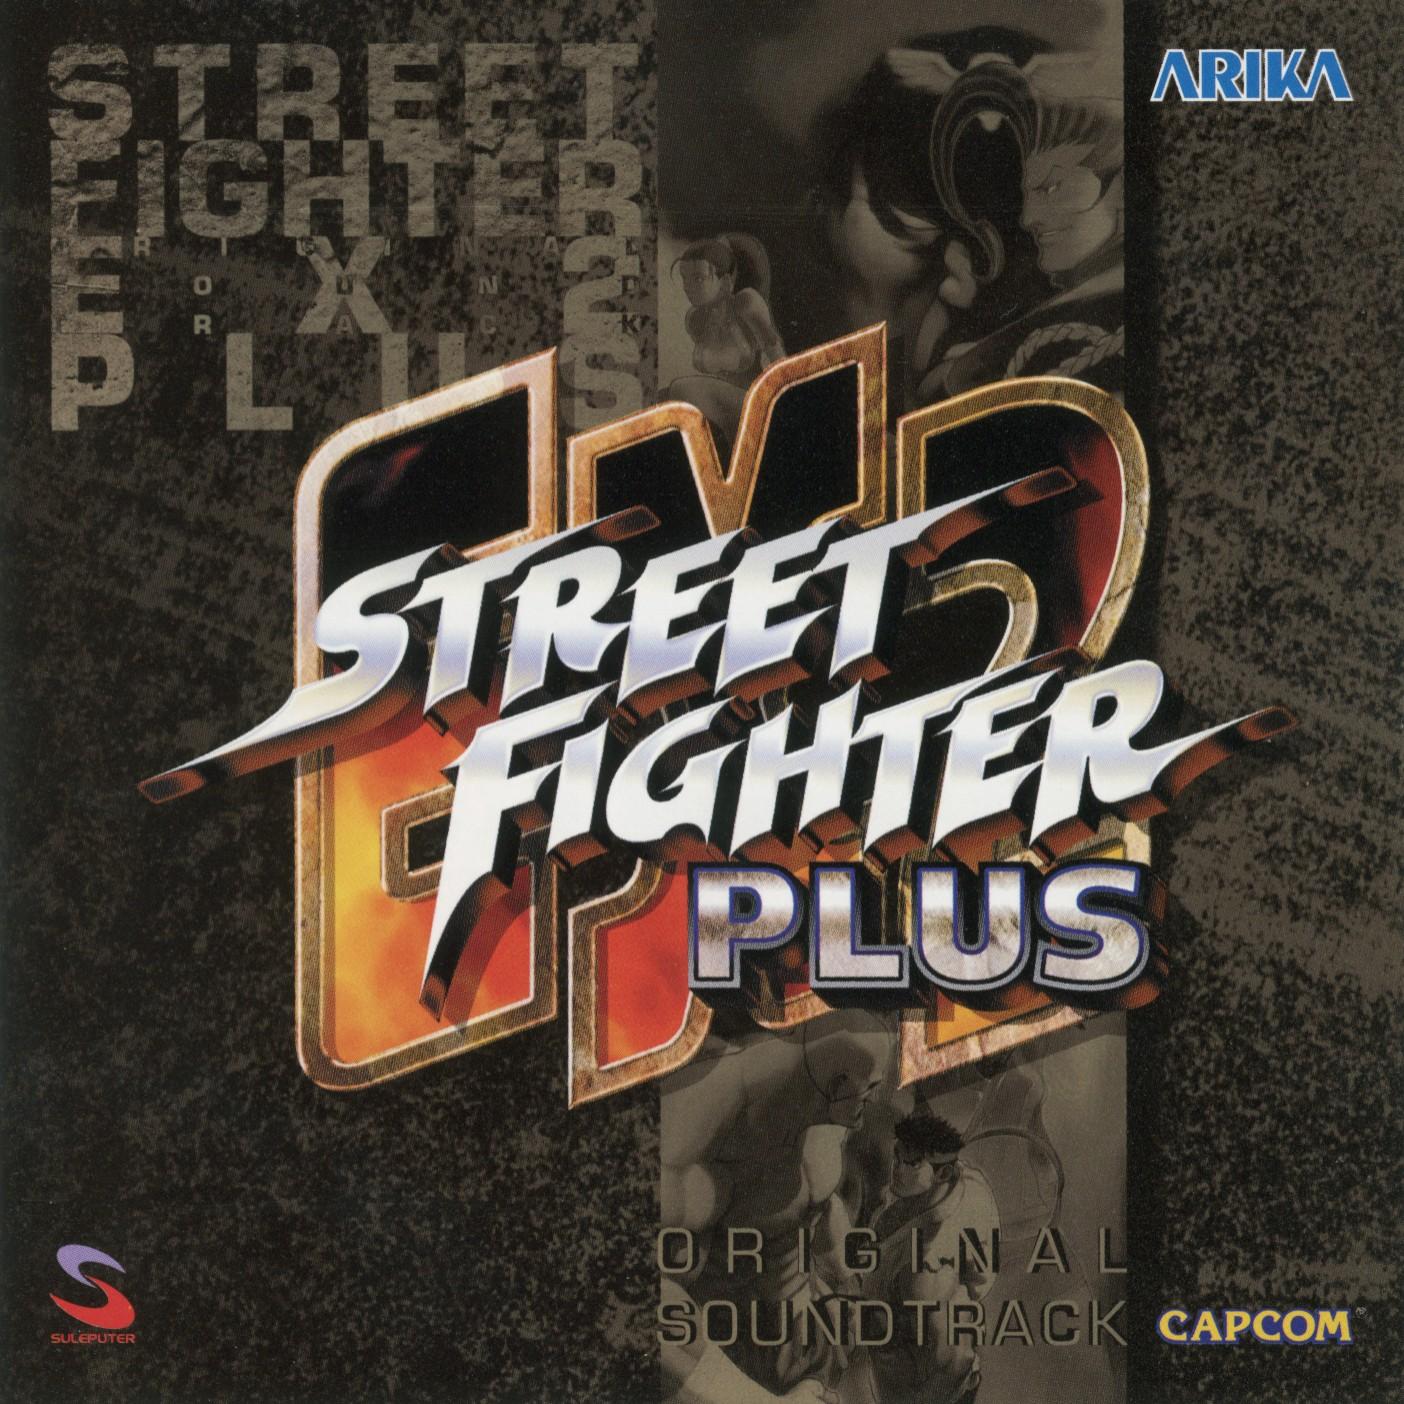 Street Fighter EX2 Plus Original Soundtrack  Soundtrack from